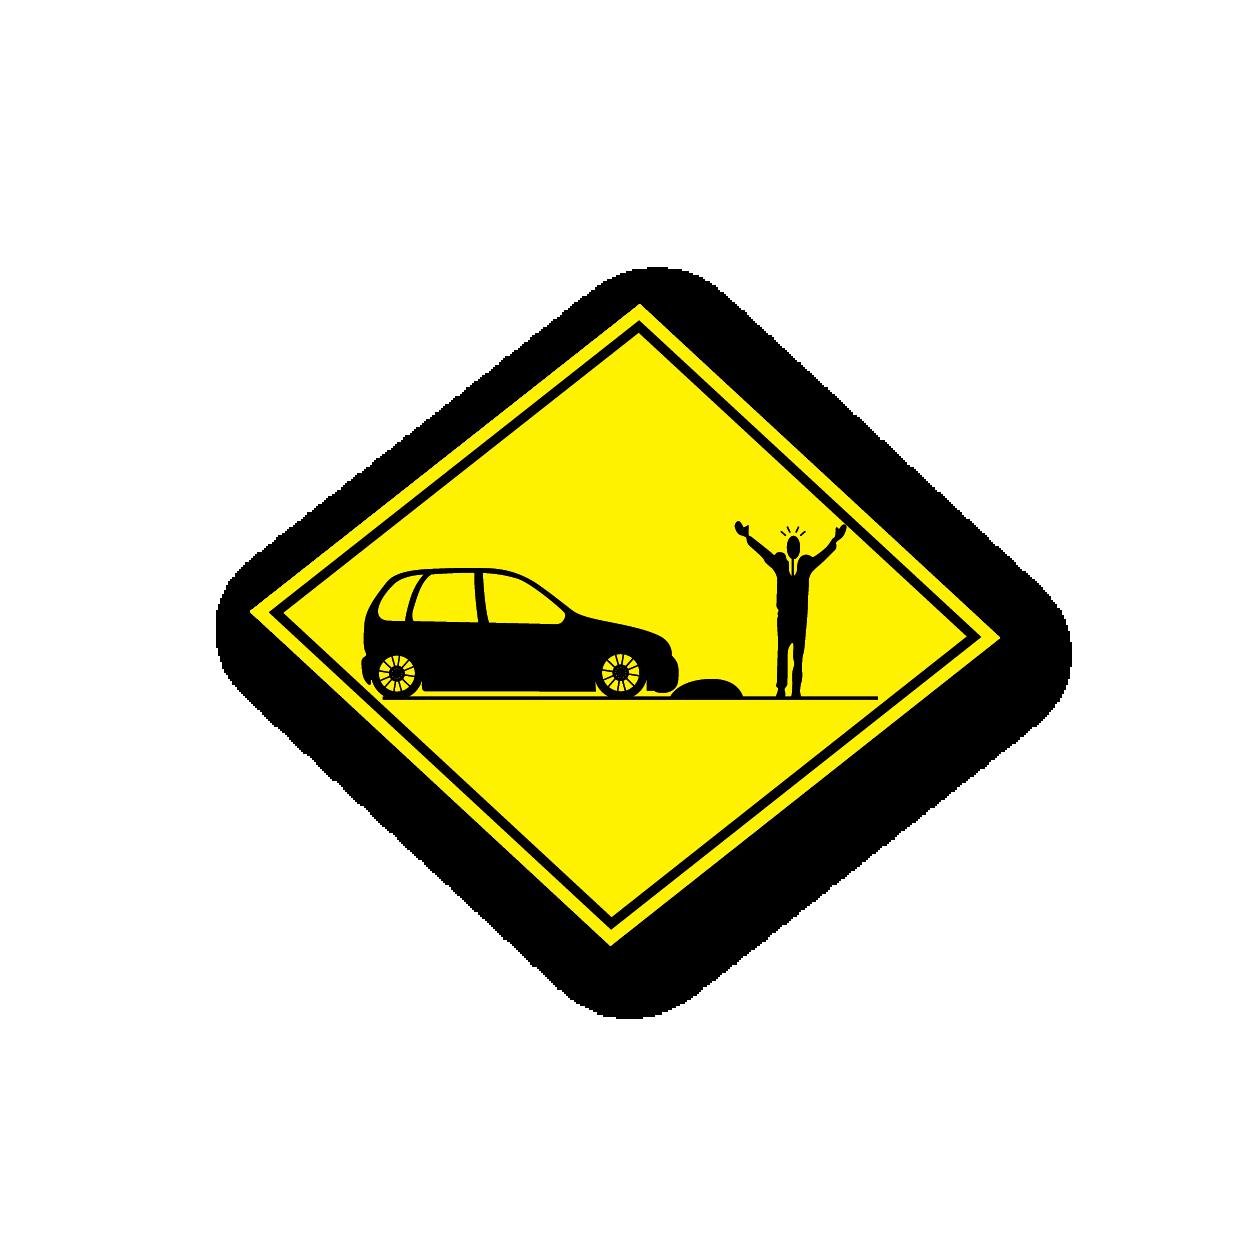 Race car crash clipart freeuse stock Caution car crash - Racing Sticker - Vinyl Sticker freeuse stock